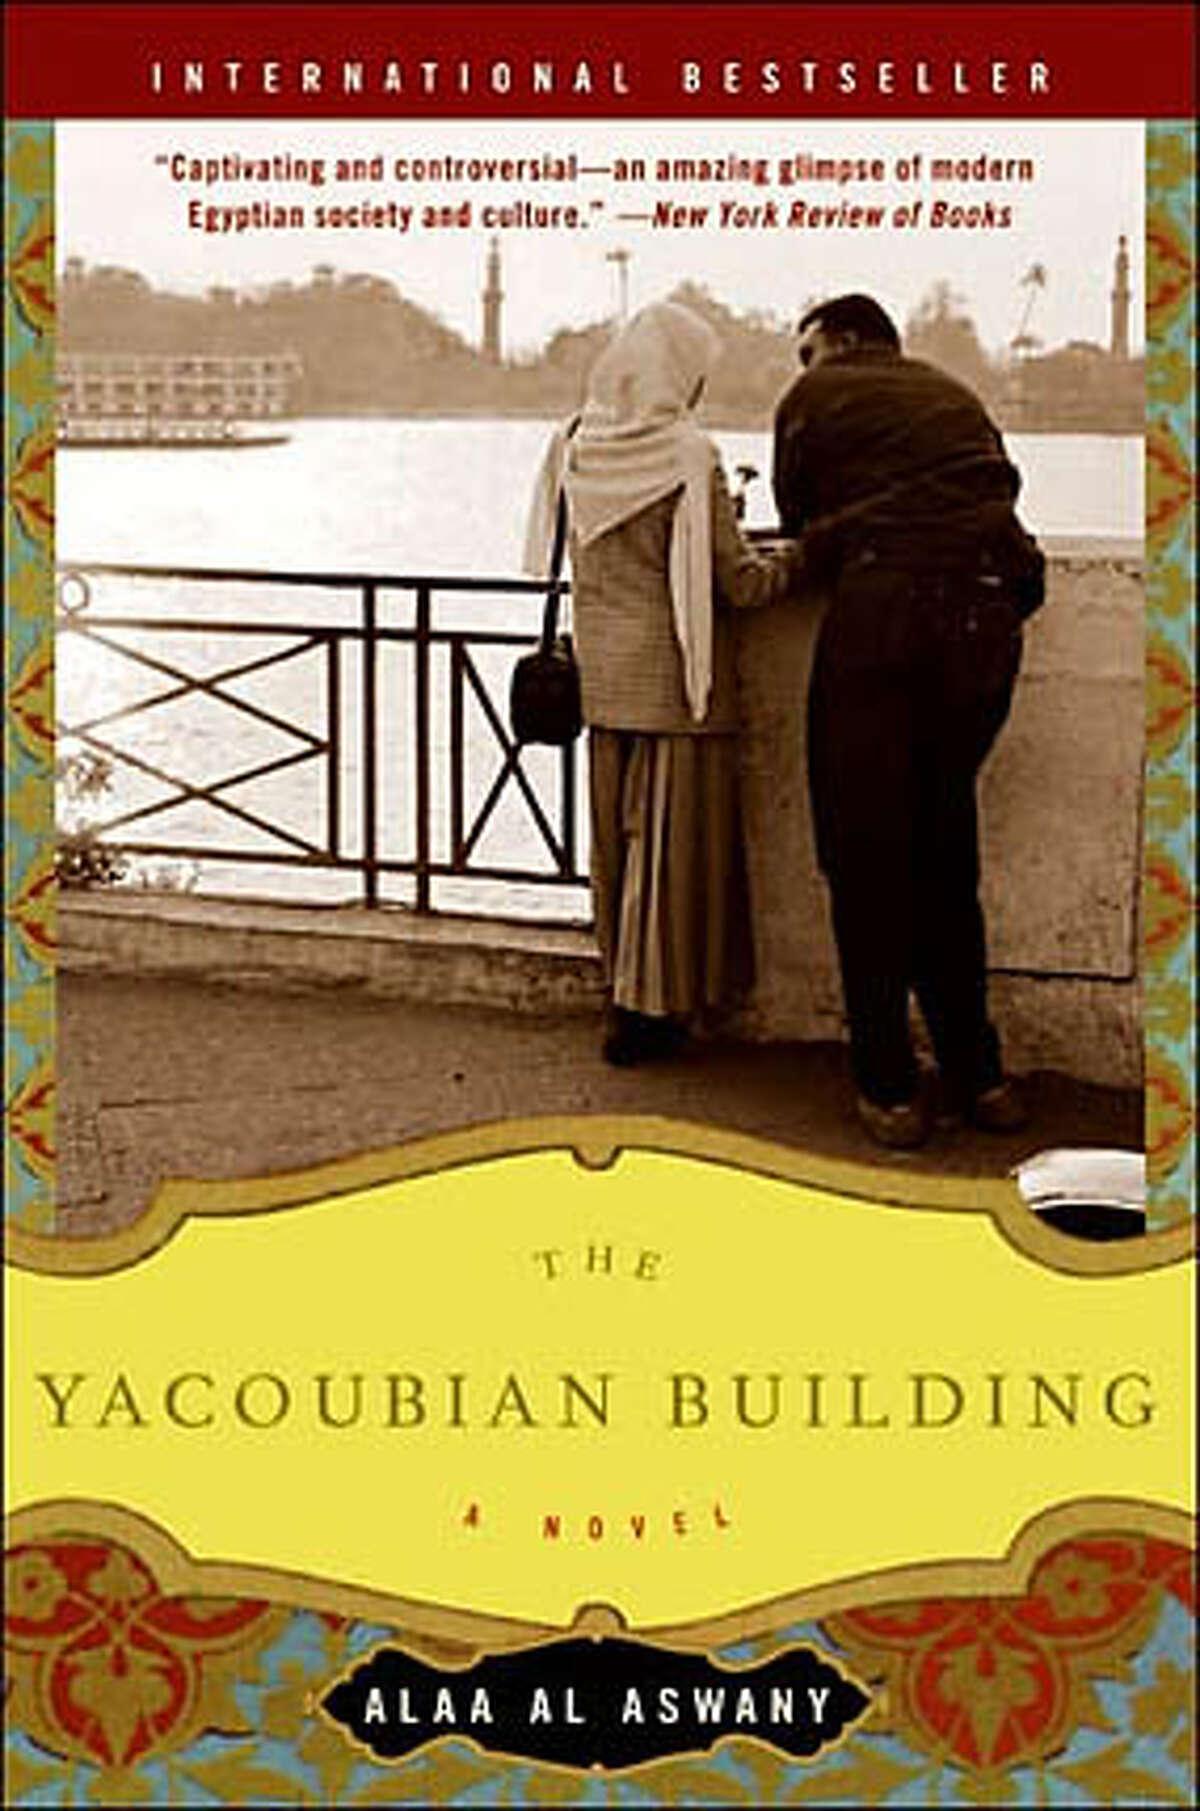 """The Yacoubian Building"" by Alaa Al Aswany, translated by Humphrey Davies"